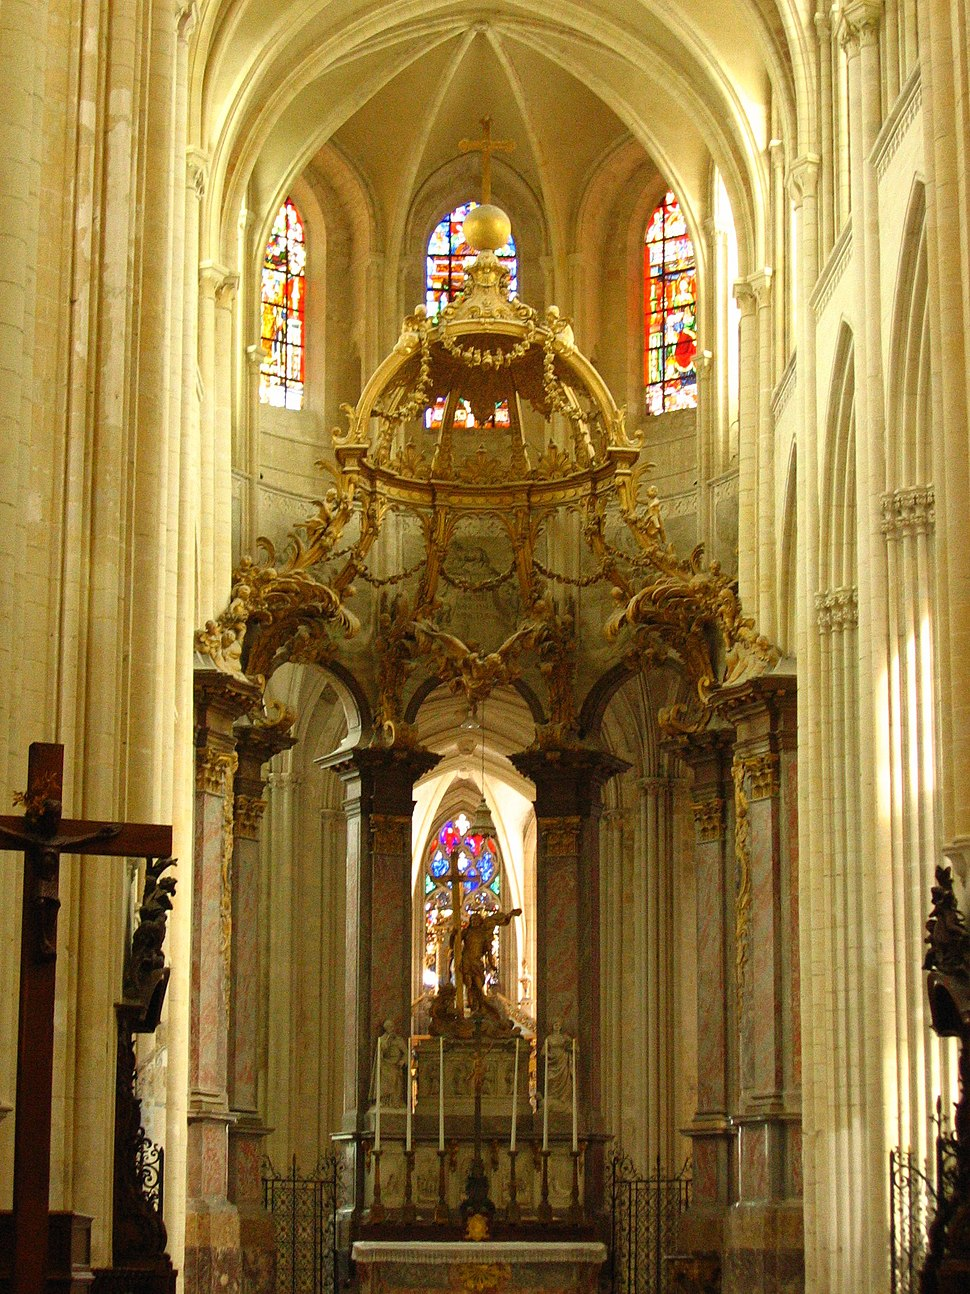 Fécamp Sainte Trinité (02a) choir